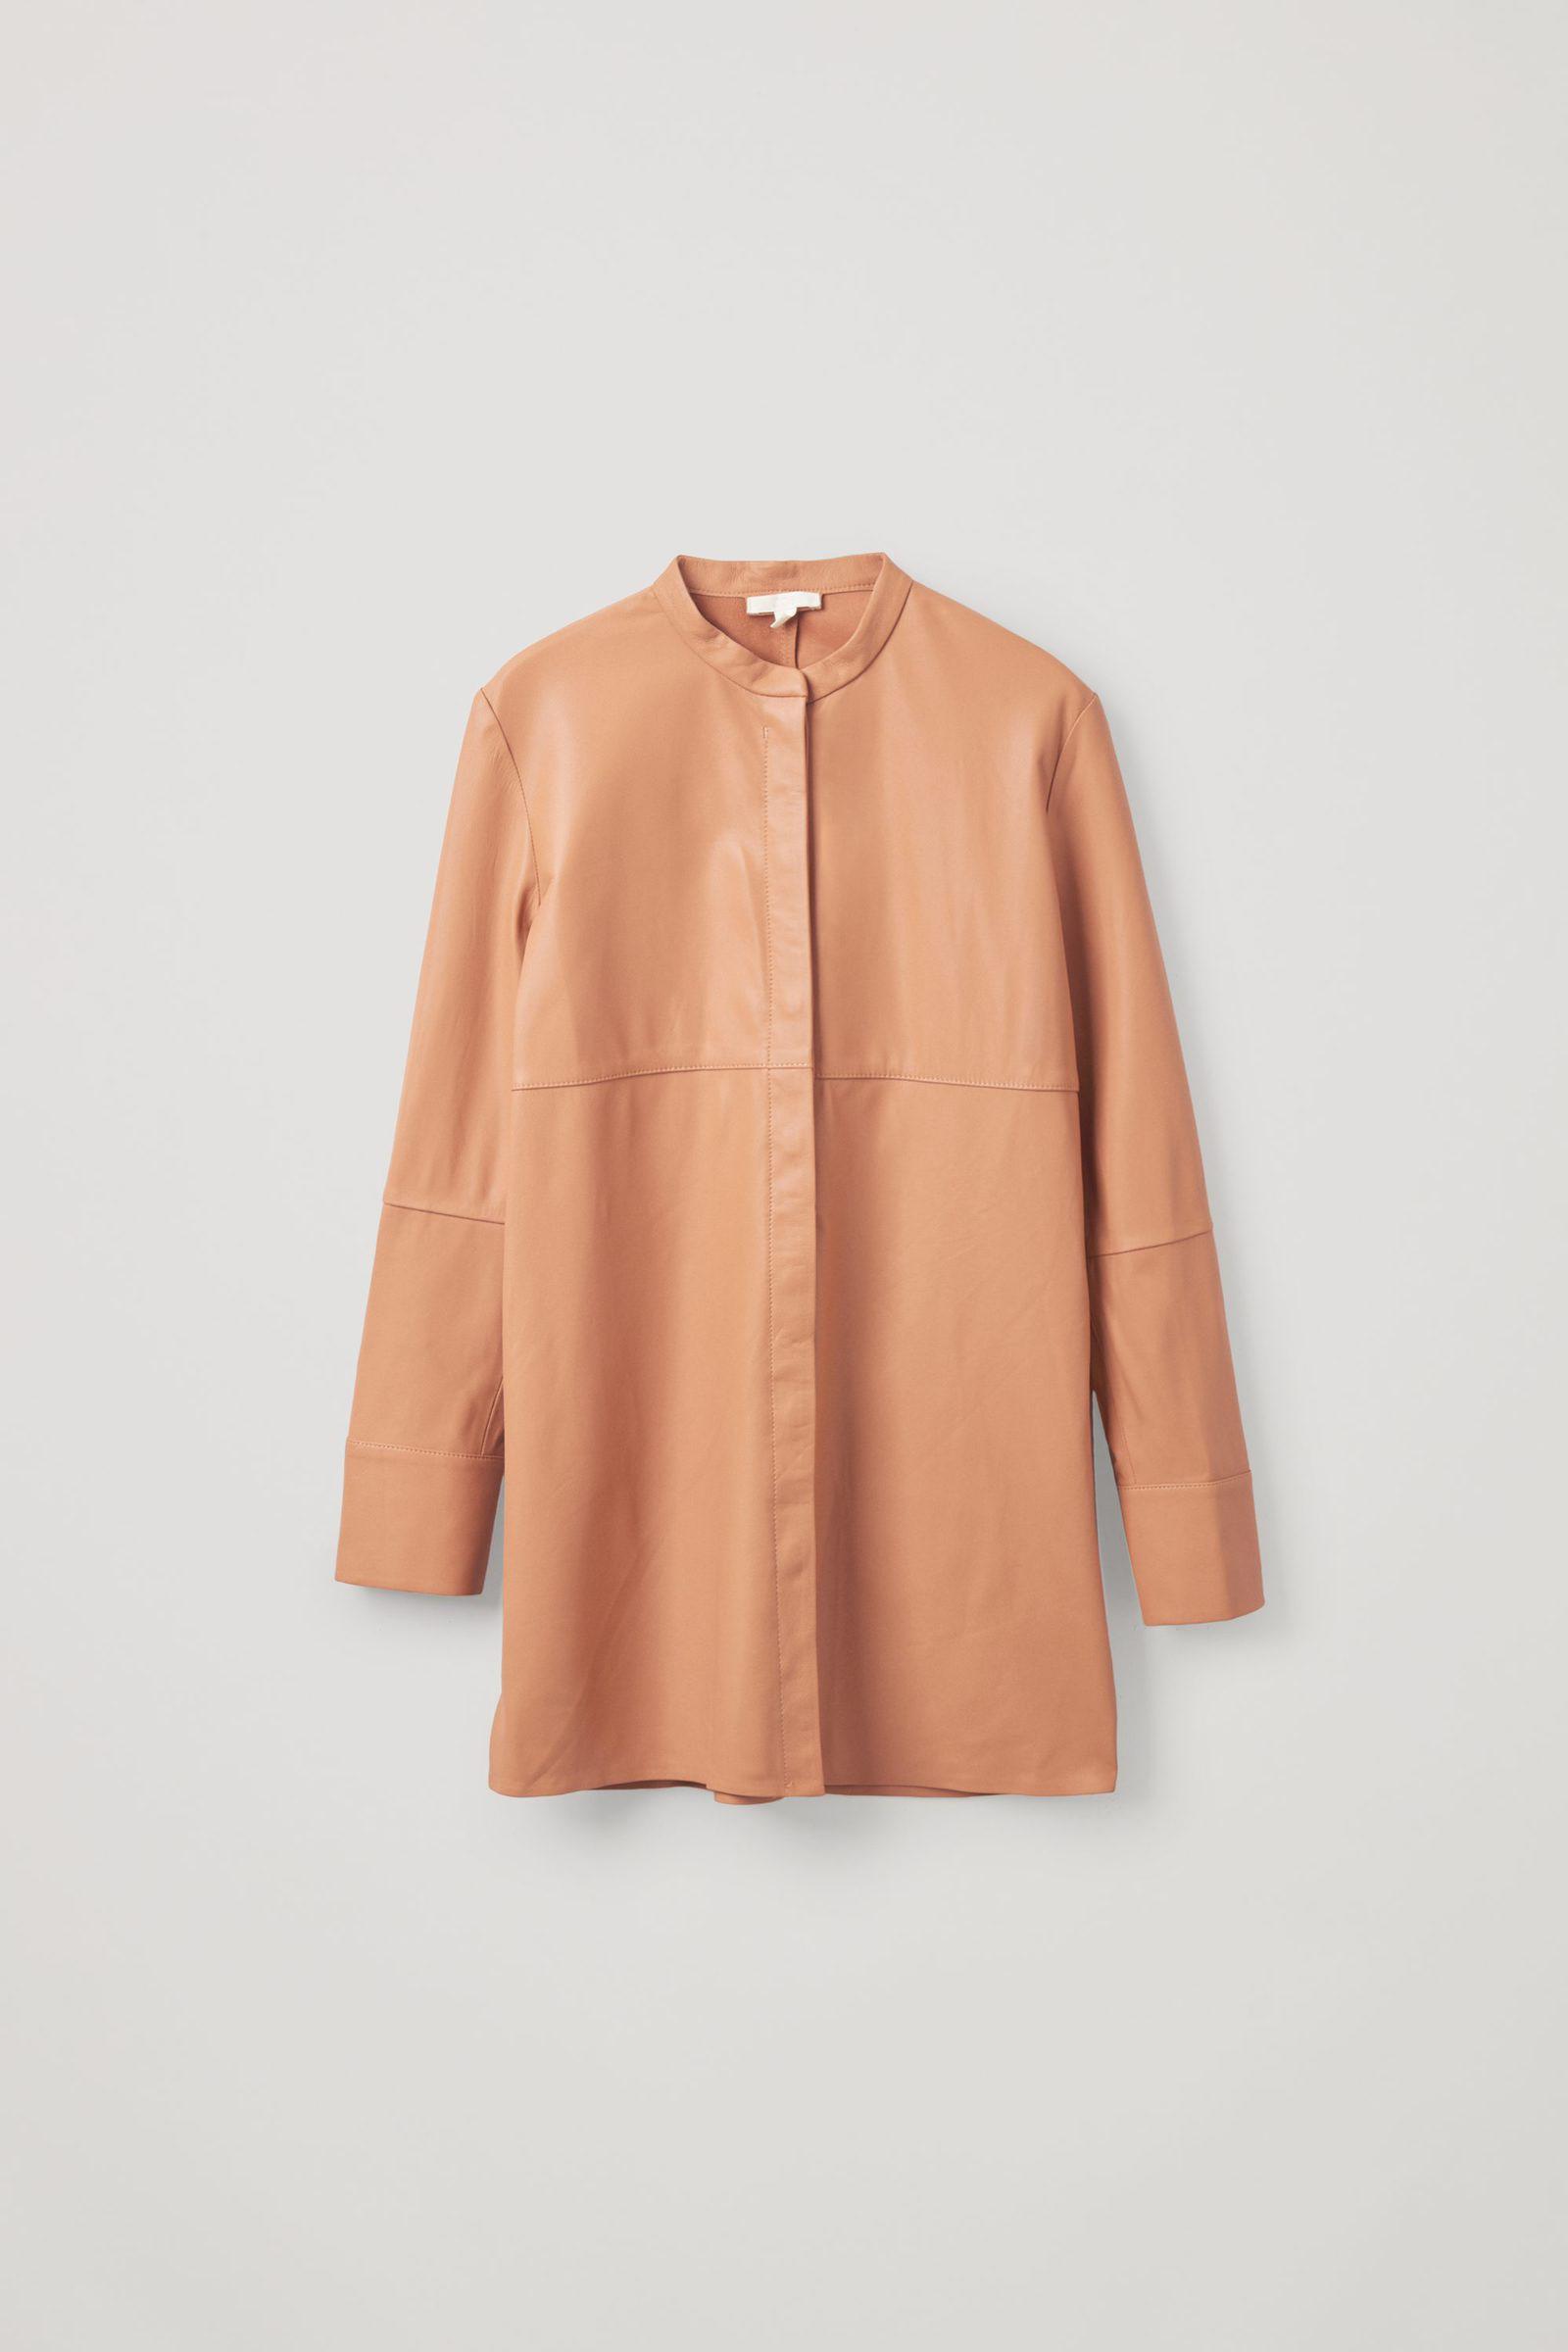 COS 오버사이즈 레더 튜닉 셔츠의 피치컬러 Product입니다.